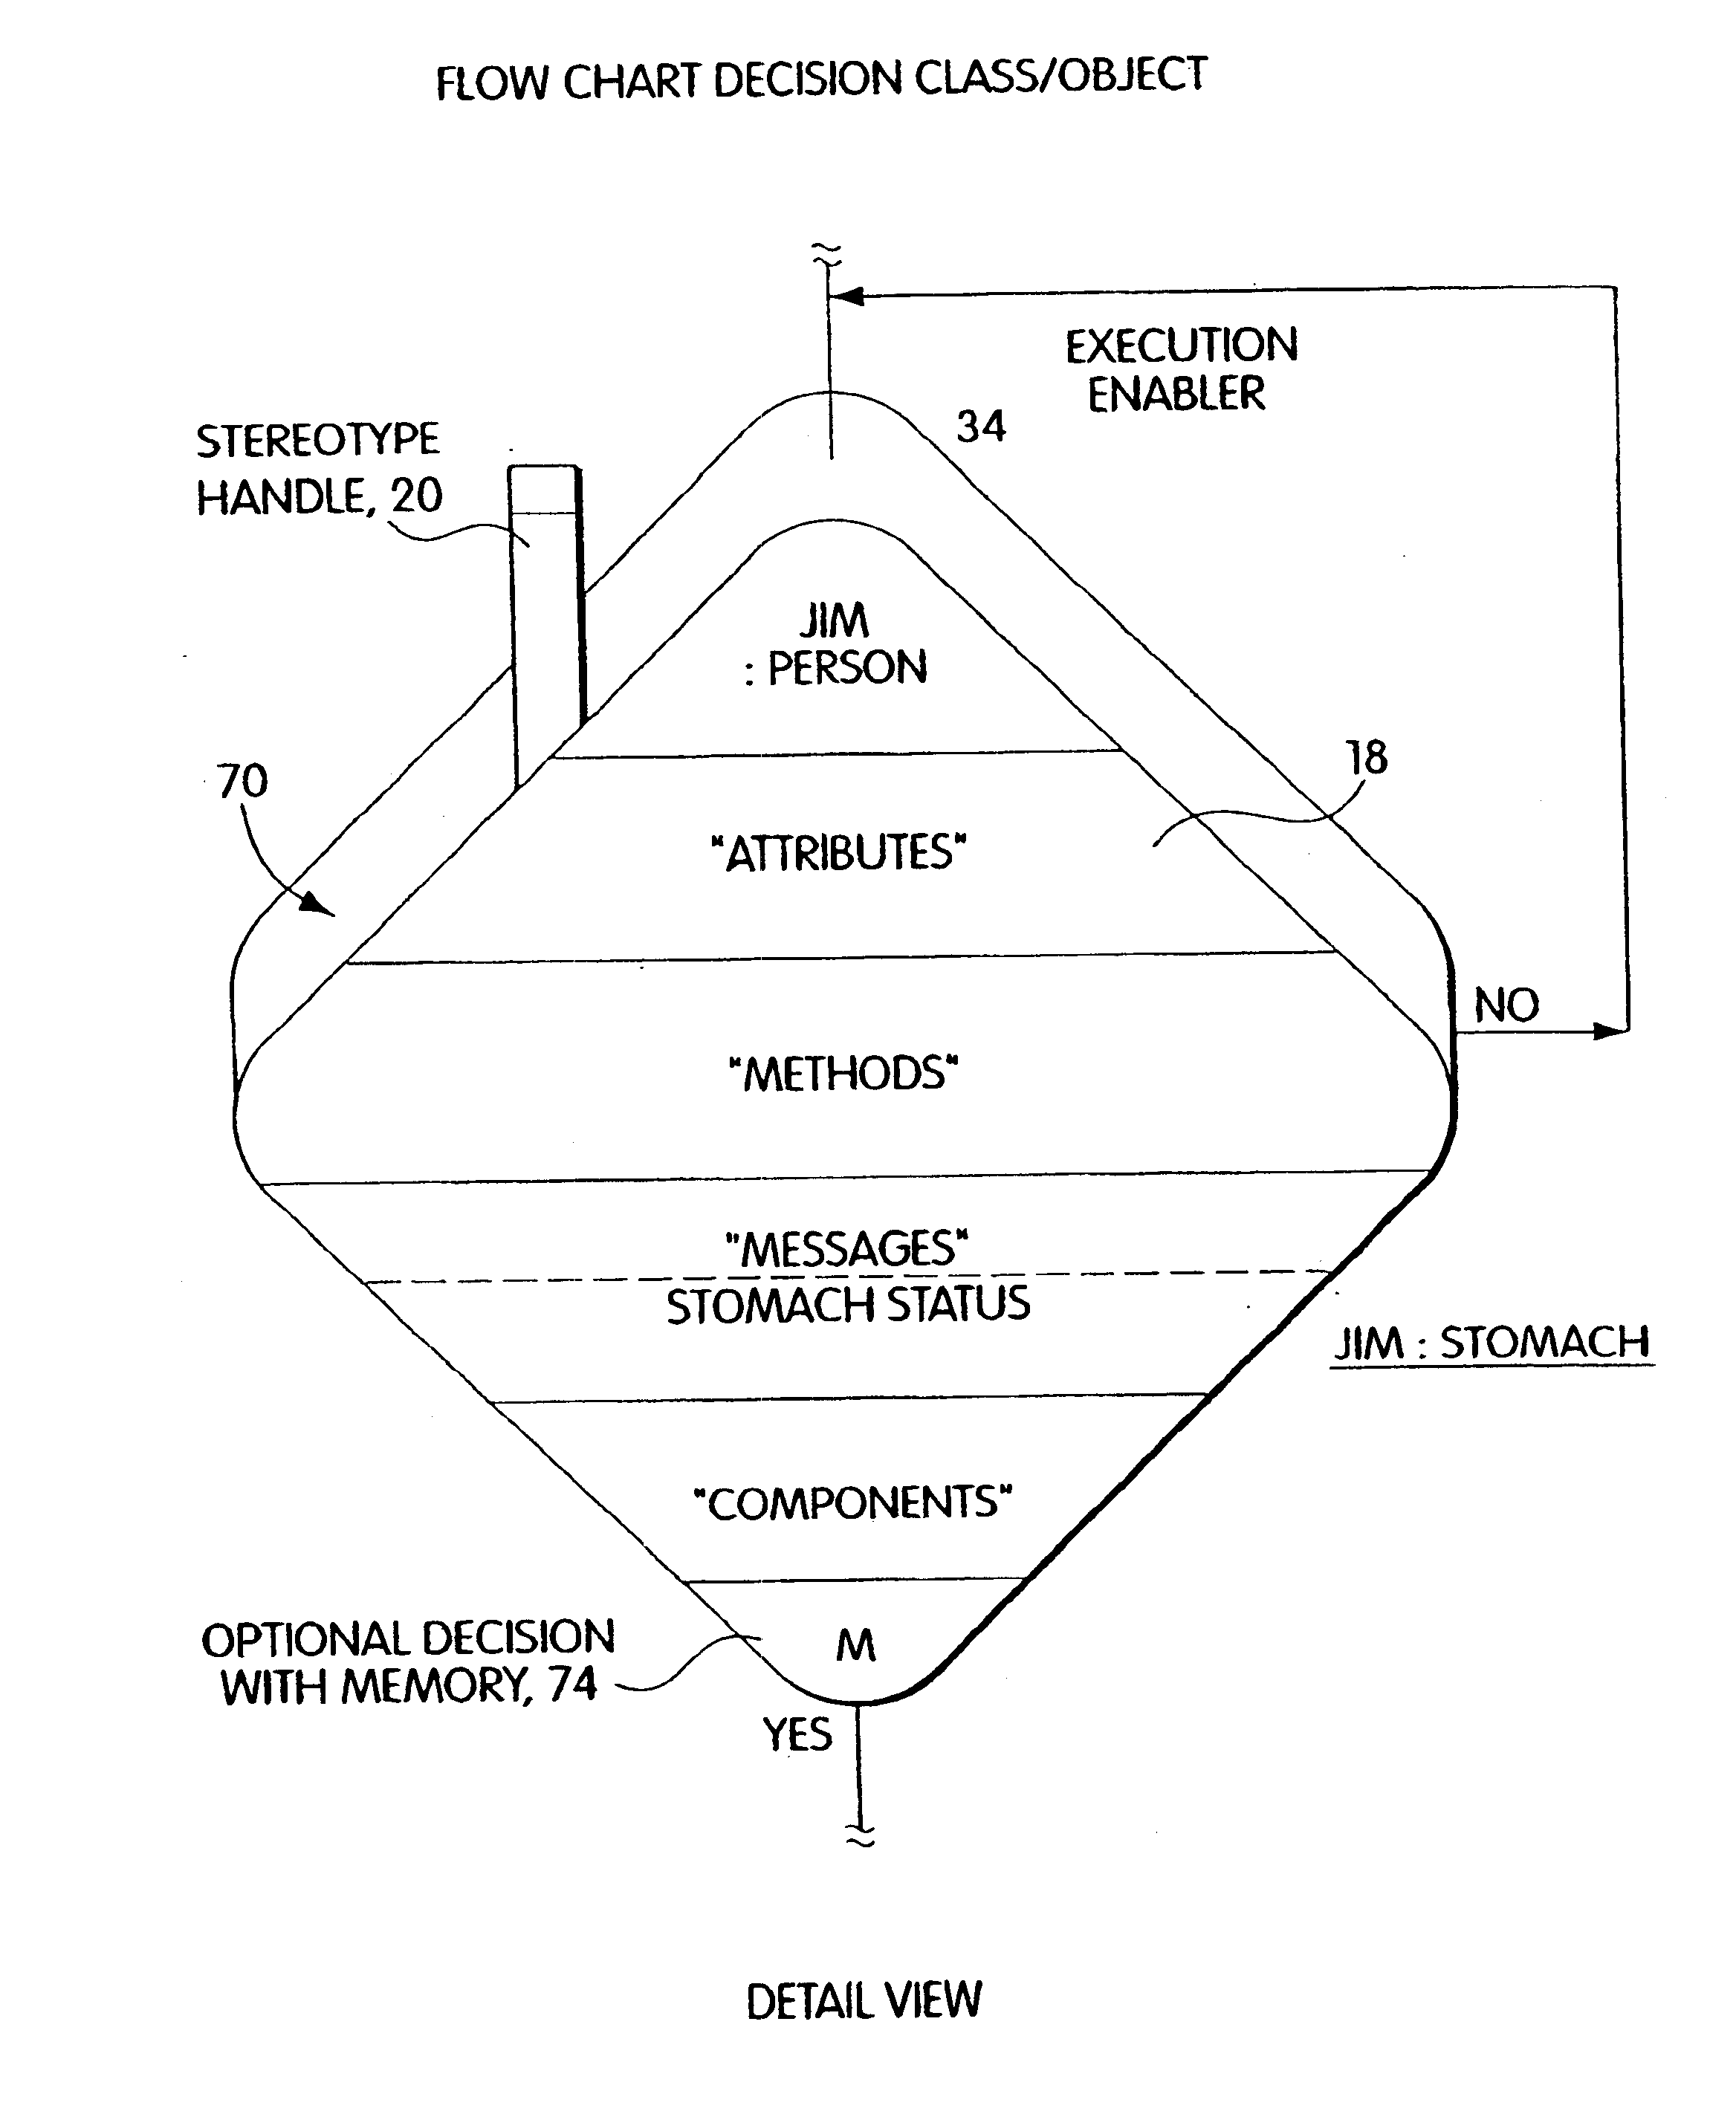 C programming flowchart pdf create a flowchart patent drawing flowcharts in c programming nvjuhfo Images